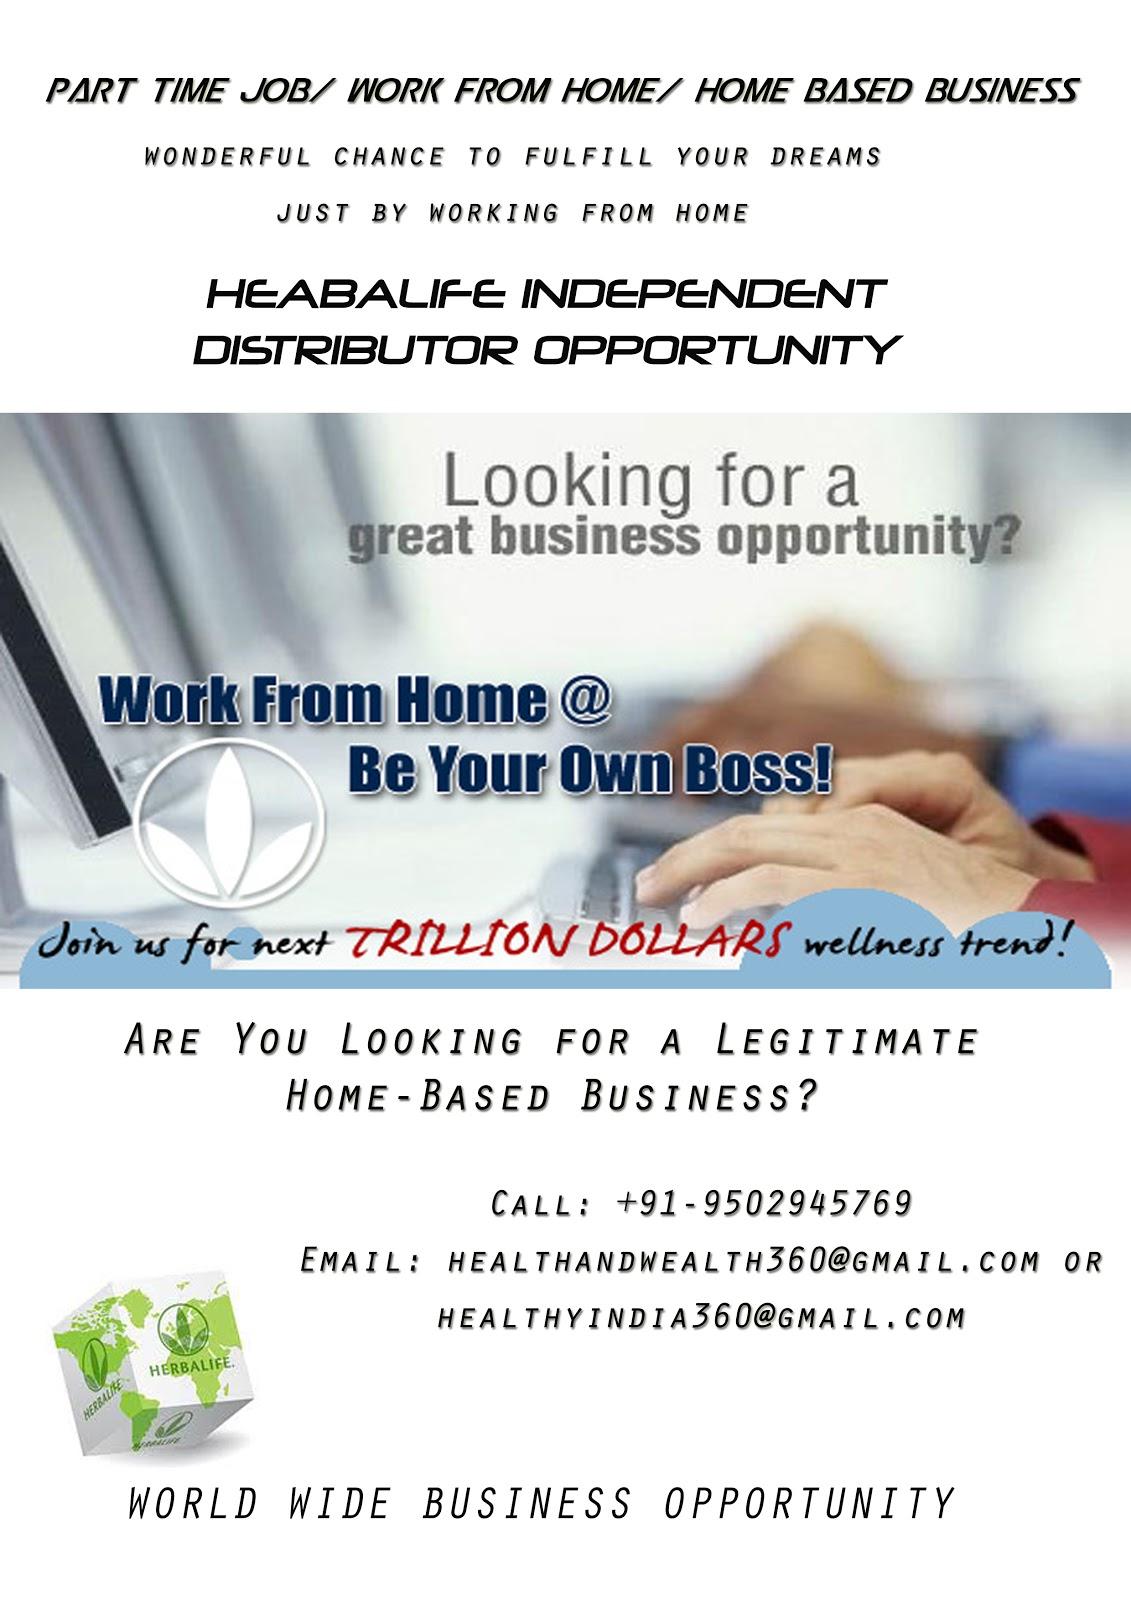 Herbalife Business Opportunity: Herbalife Flyer